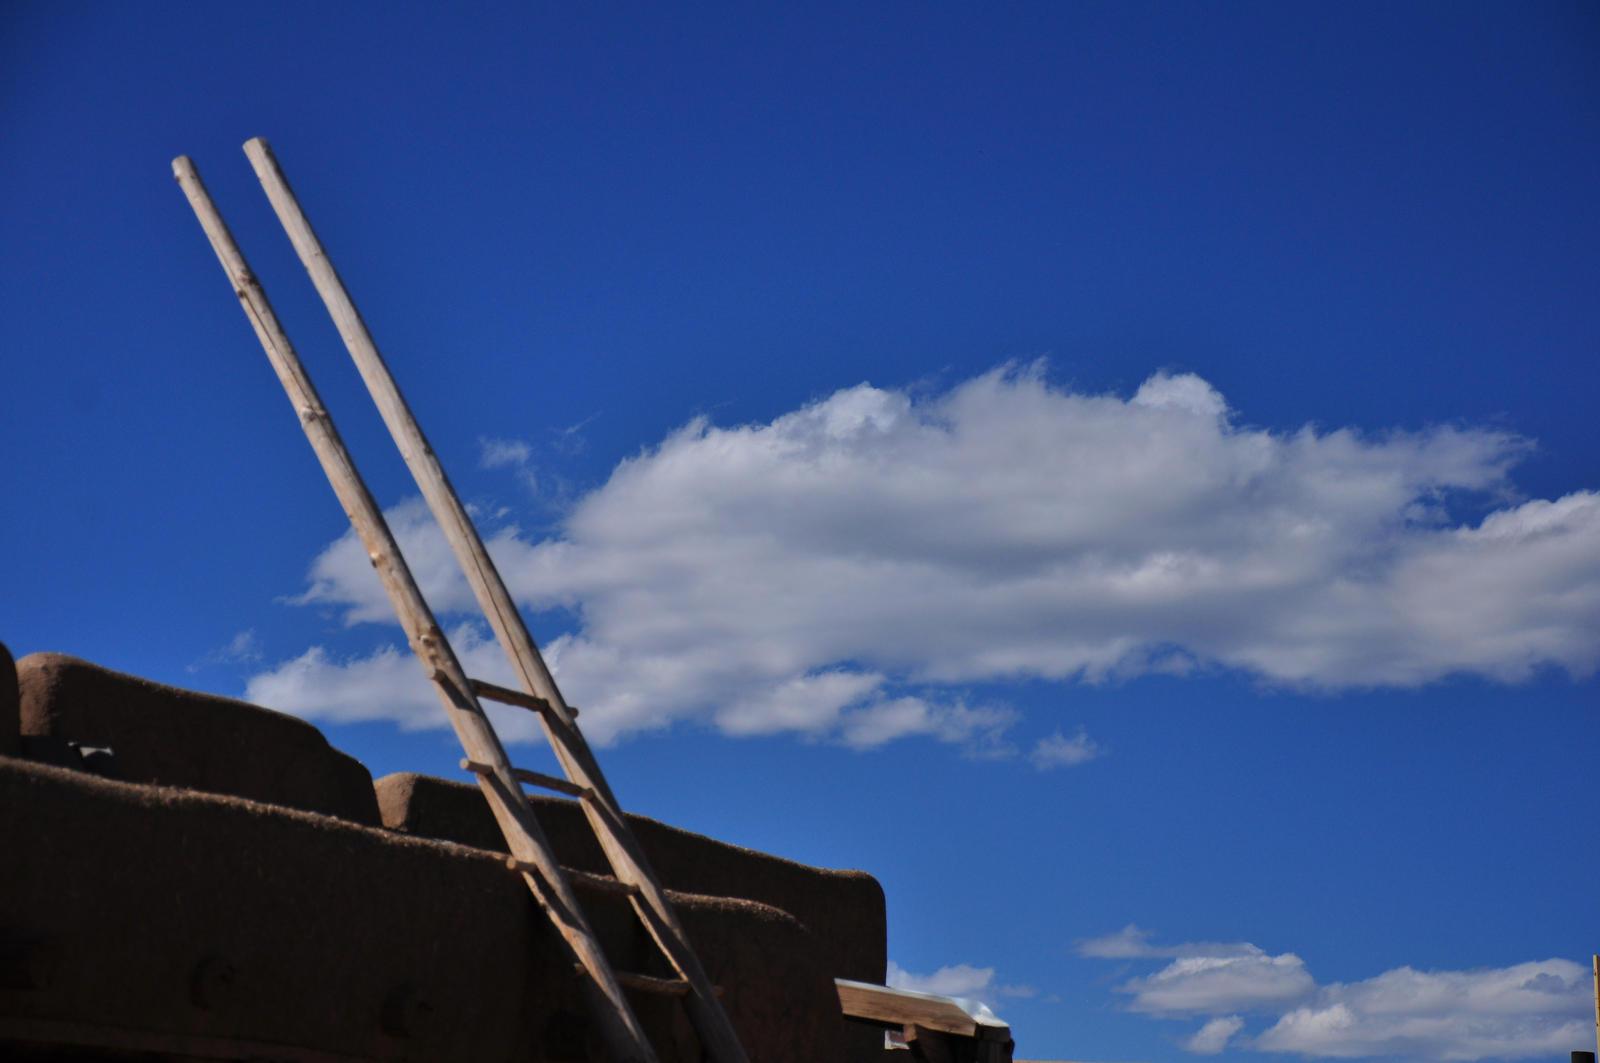 Pantograph on the sky by Michaeldavitt